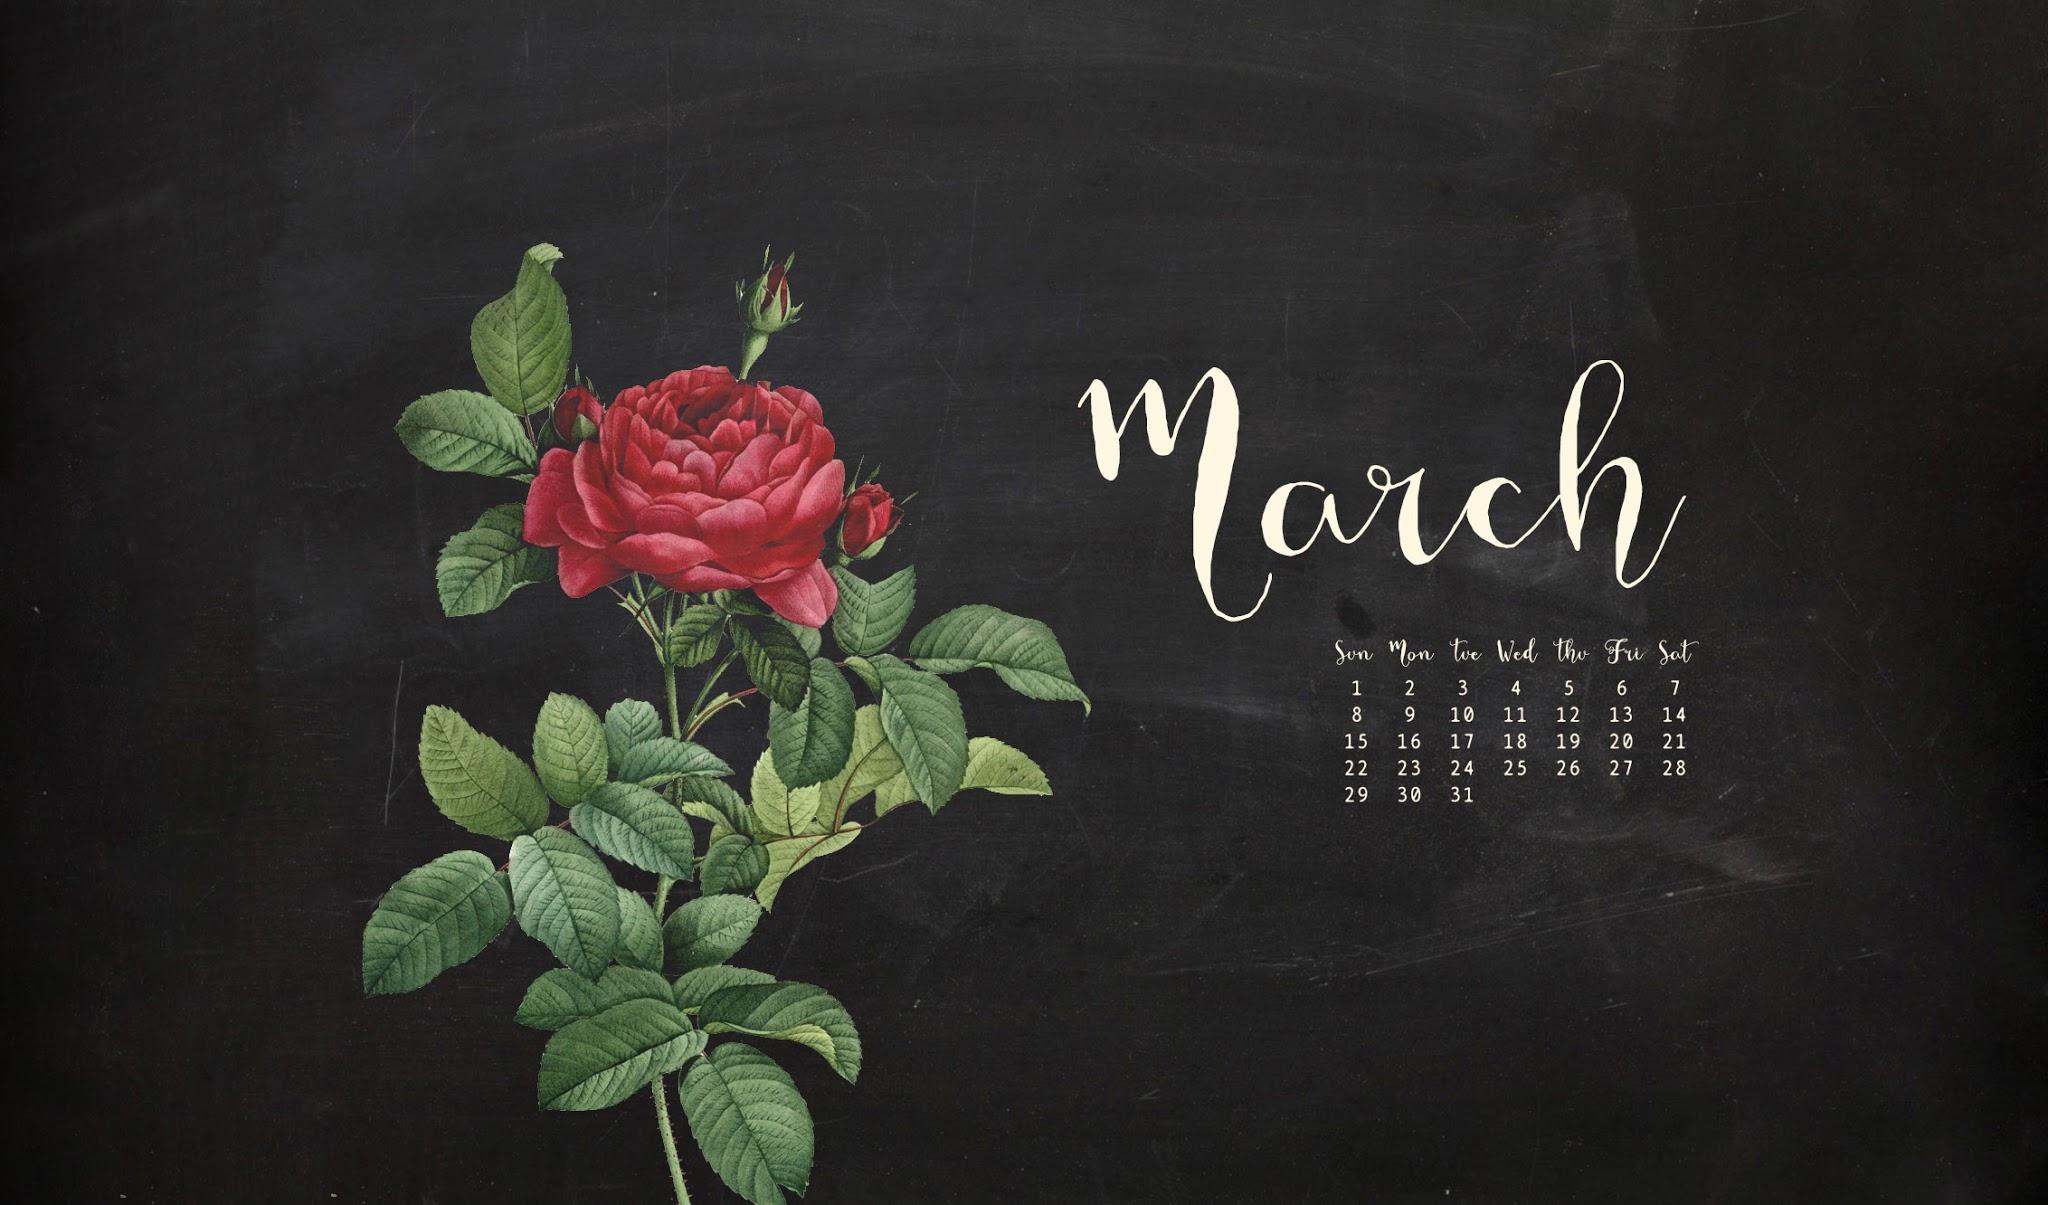 Forest dreams - March desktop wallpaper ...